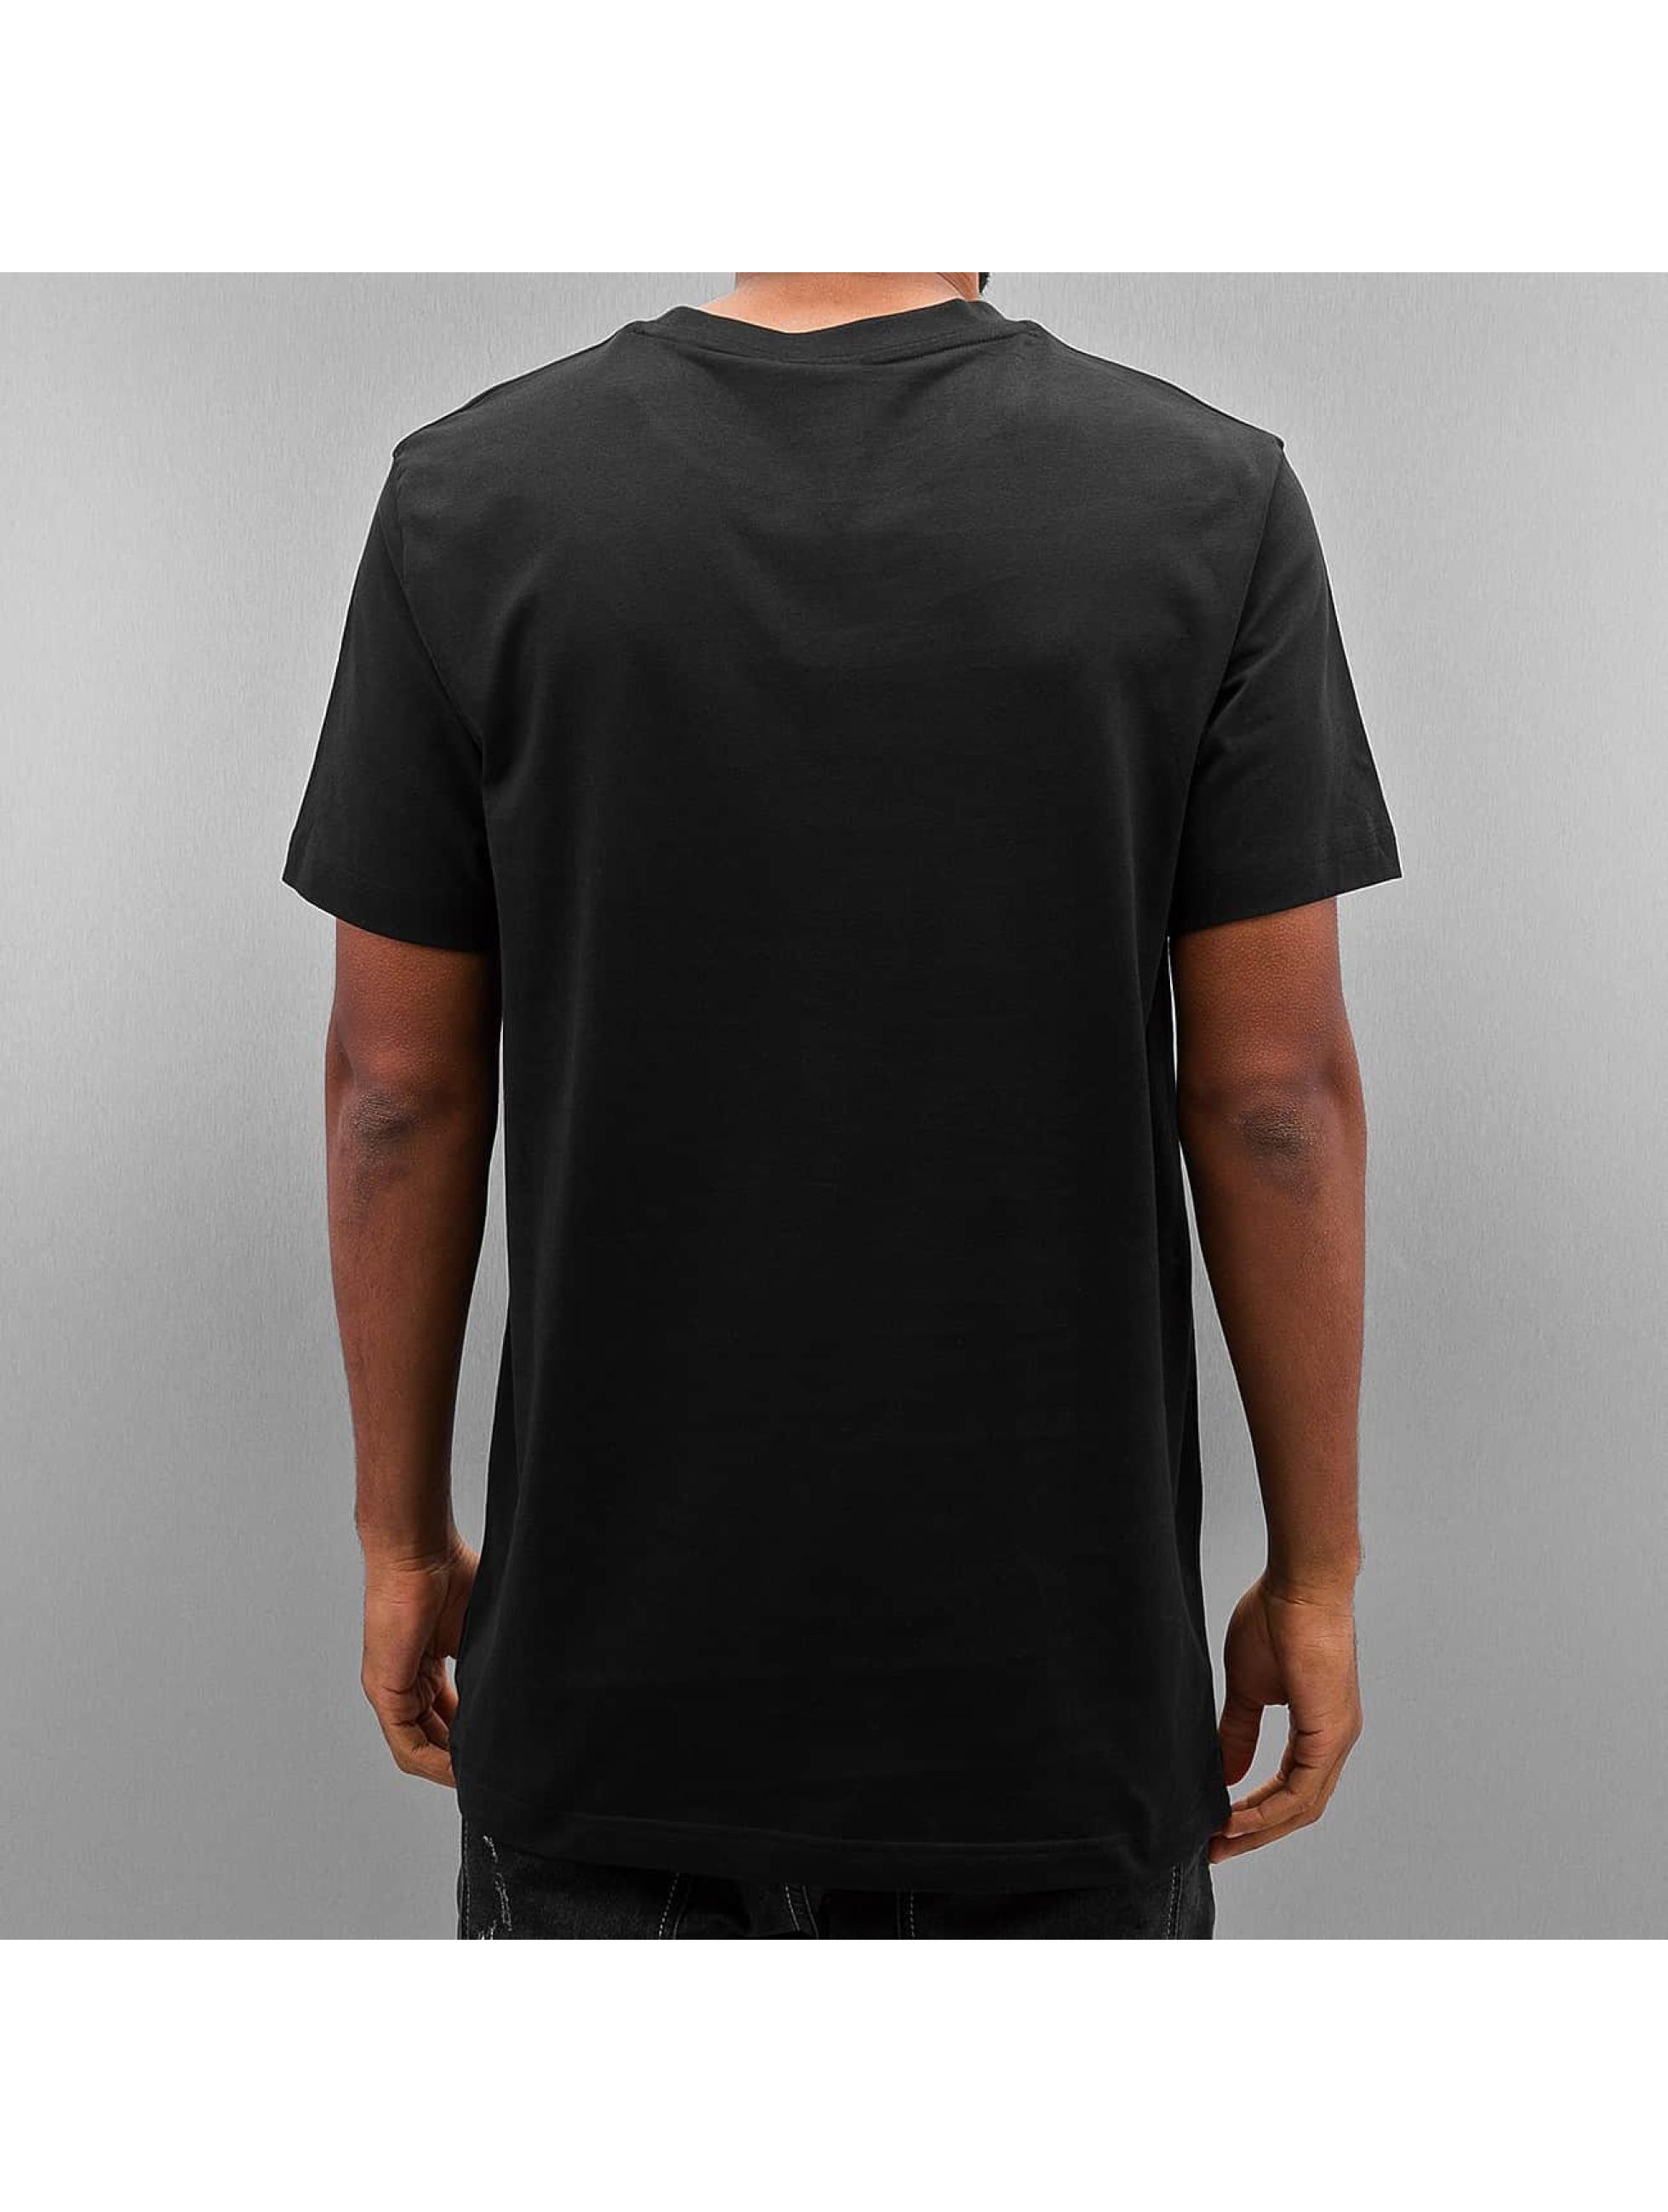 K1X t-shirt Authentic zwart